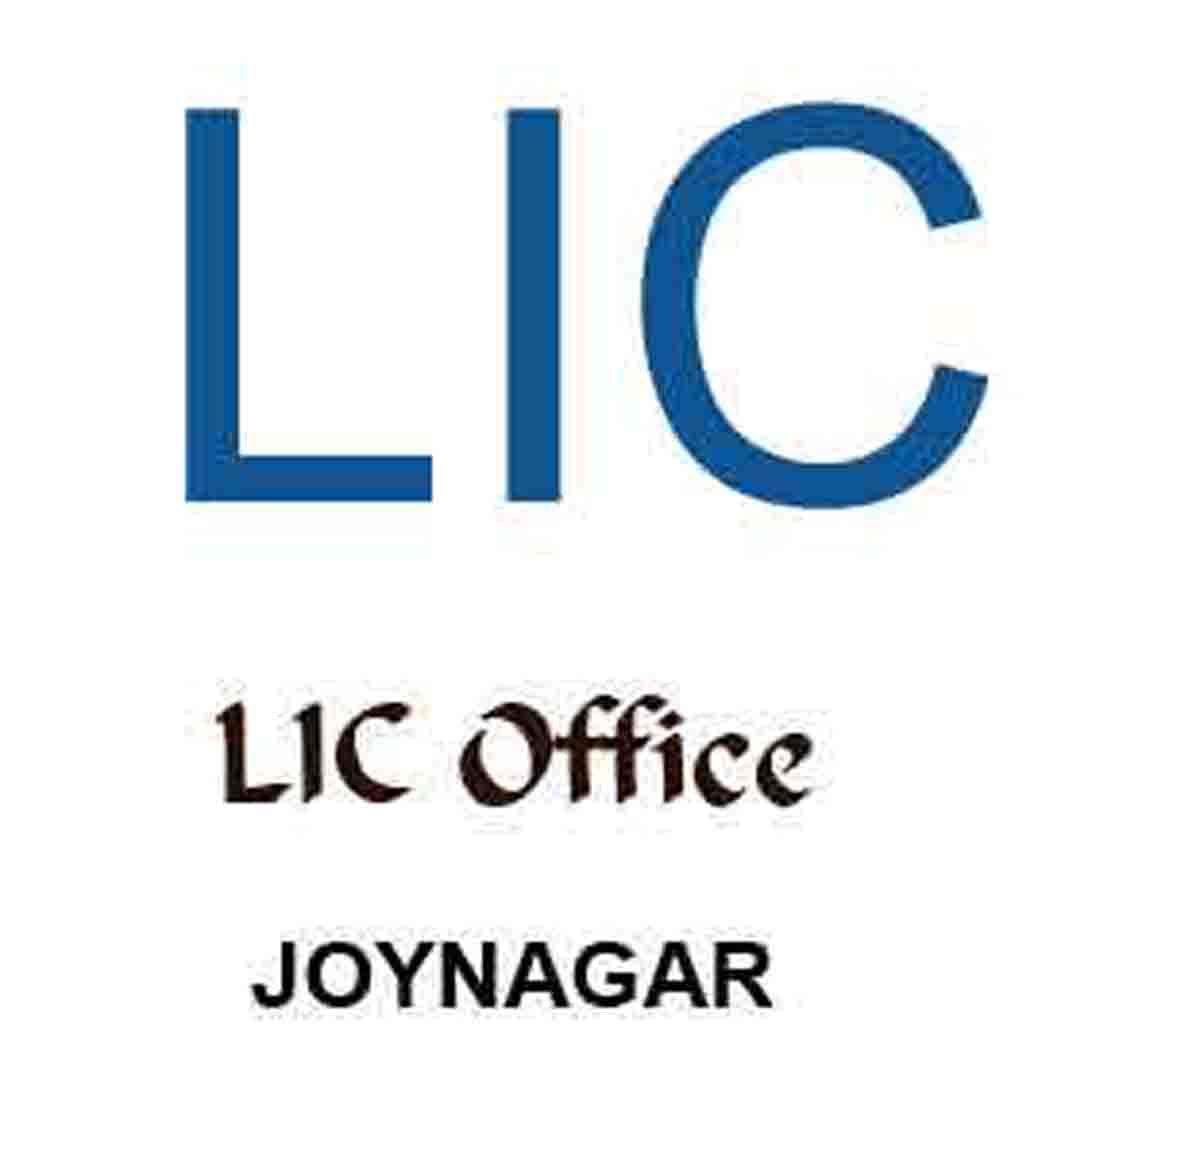 lic office joynagar